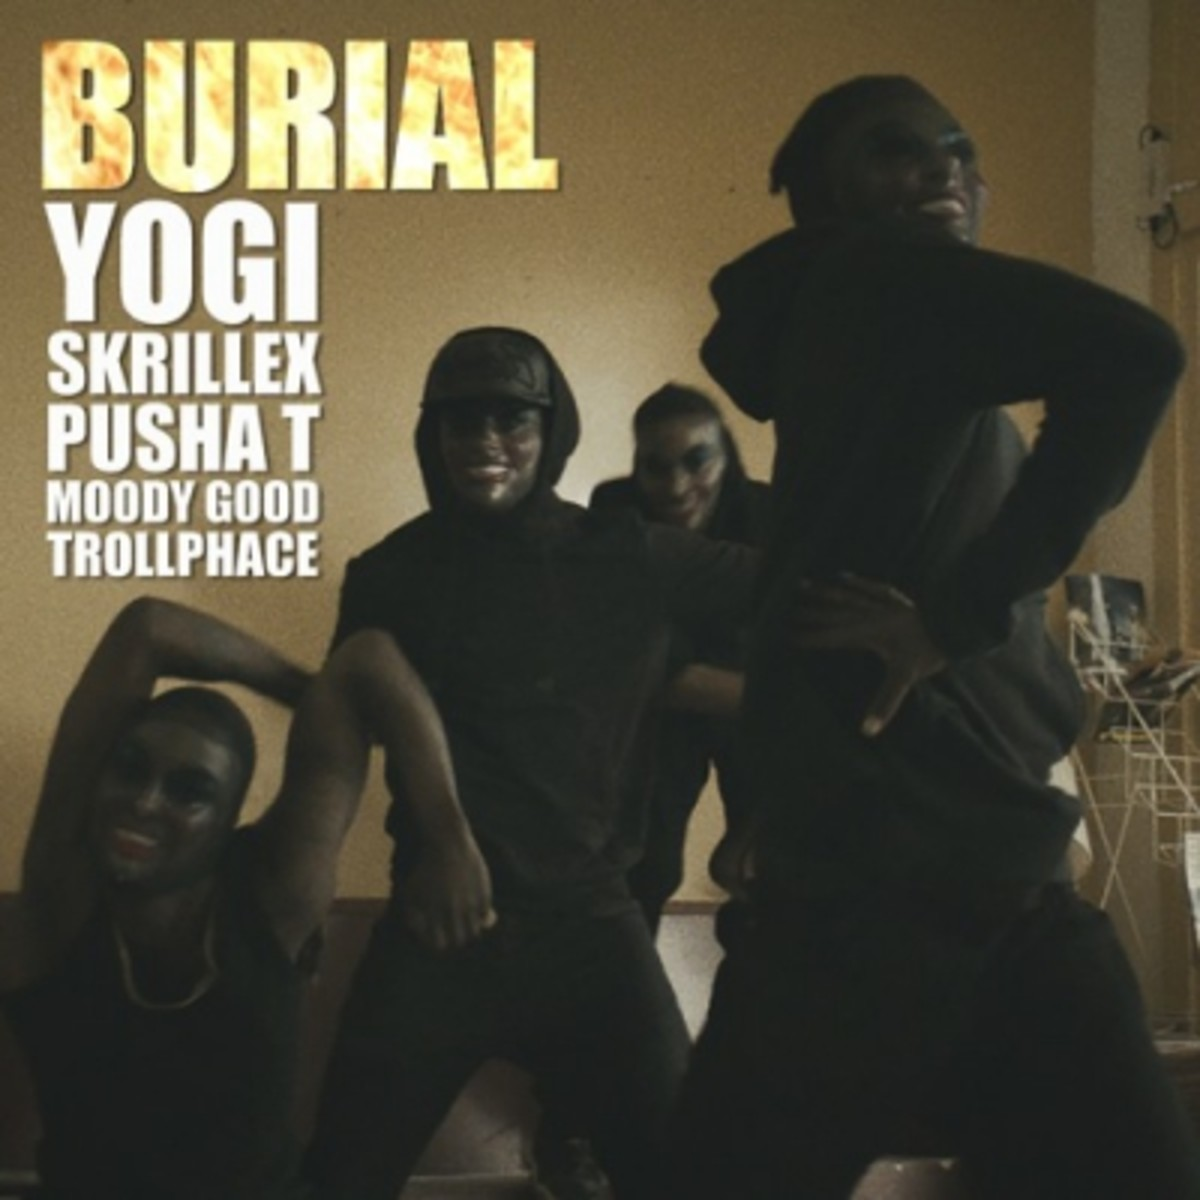 yogi-skrillex-burial.jpg